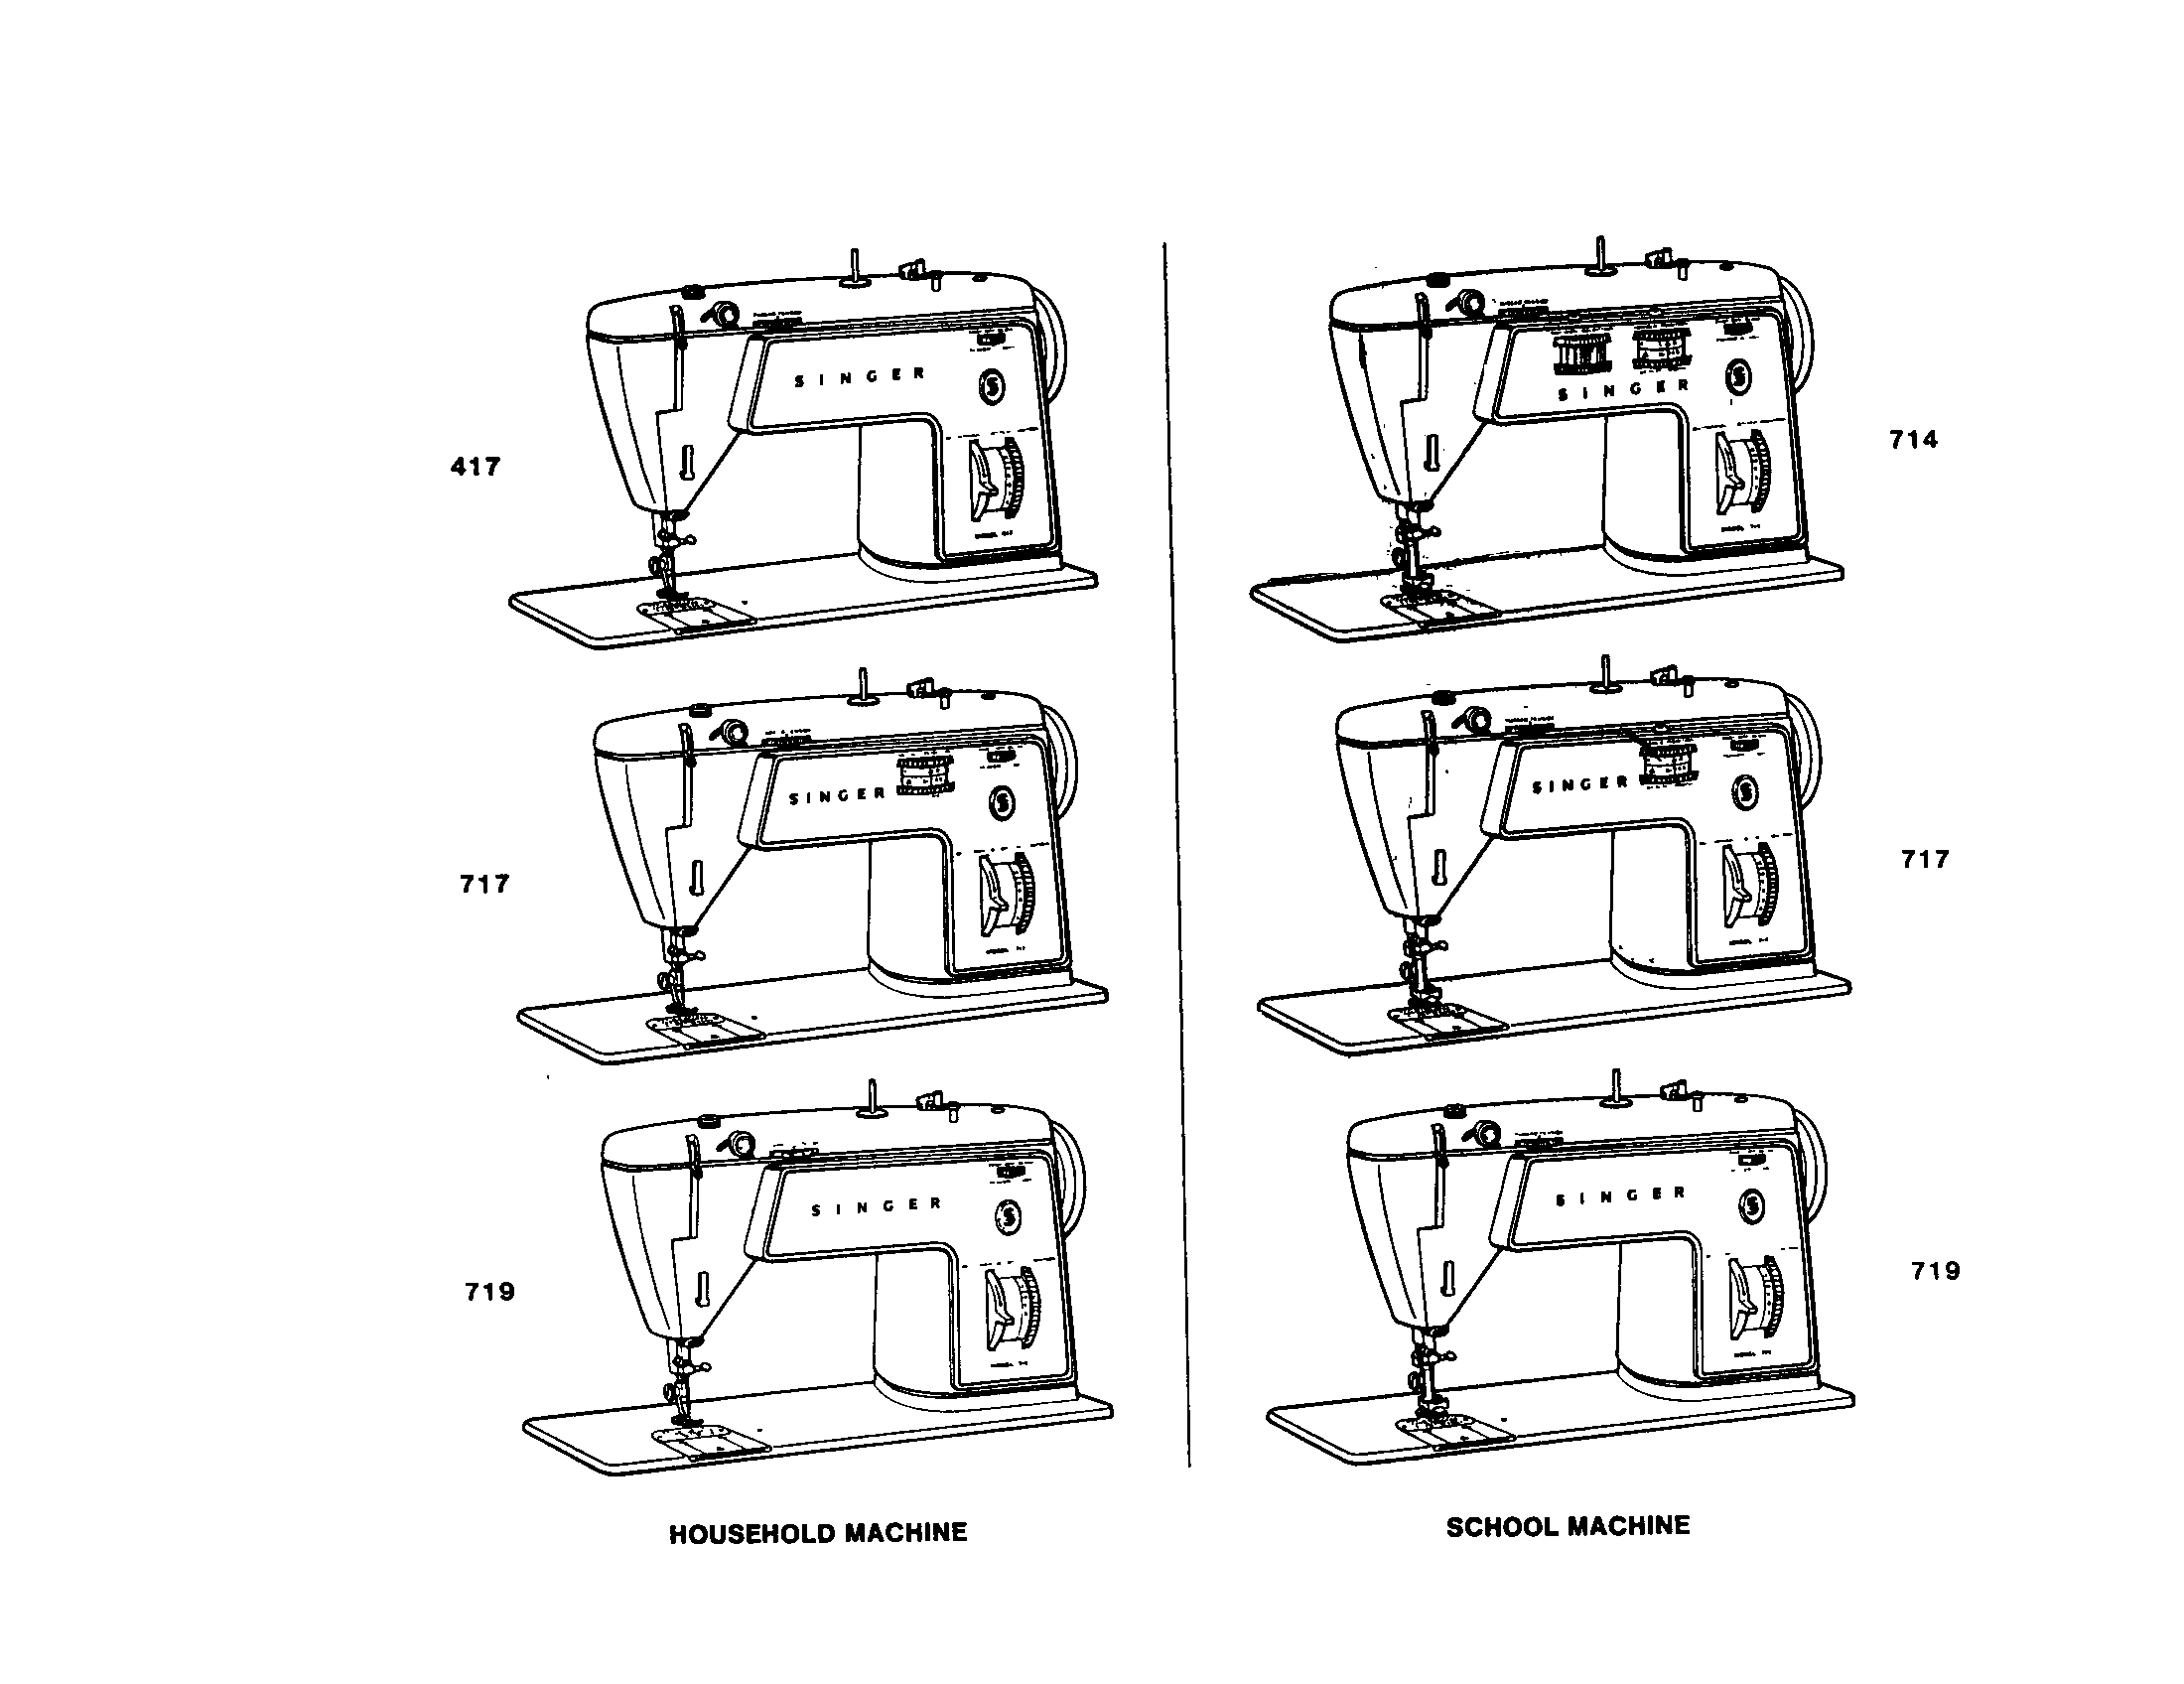 401-TYPE HOOK MACHINES Diagram & Parts List for Model